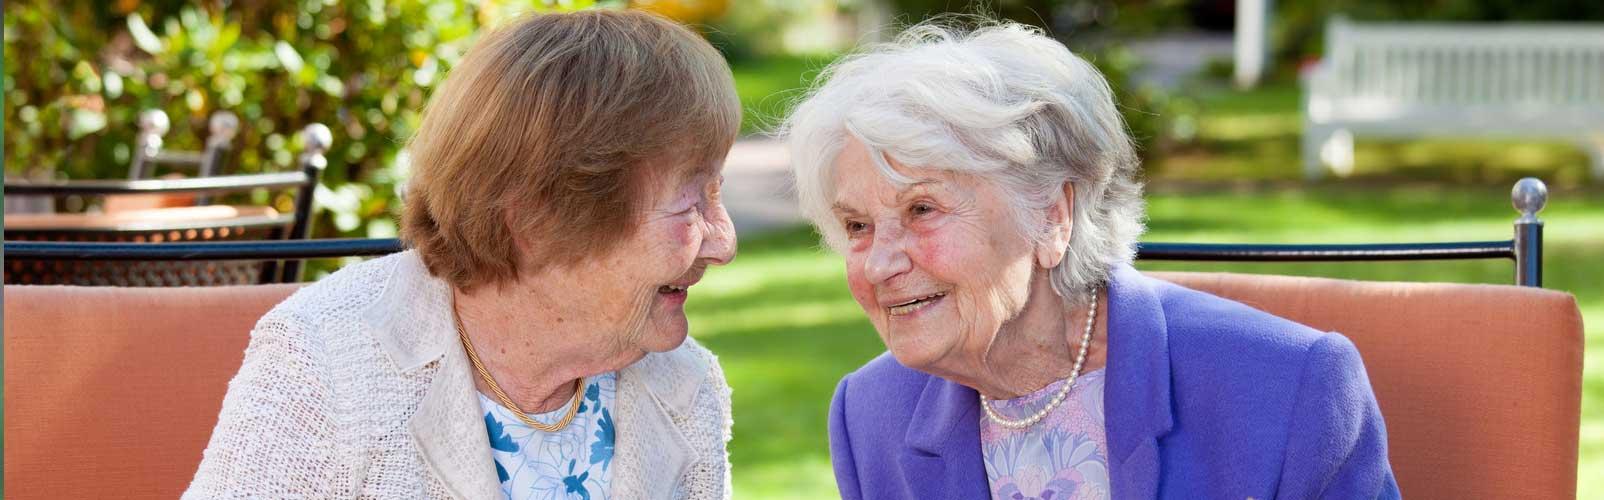 Elderly ladies having a conversation